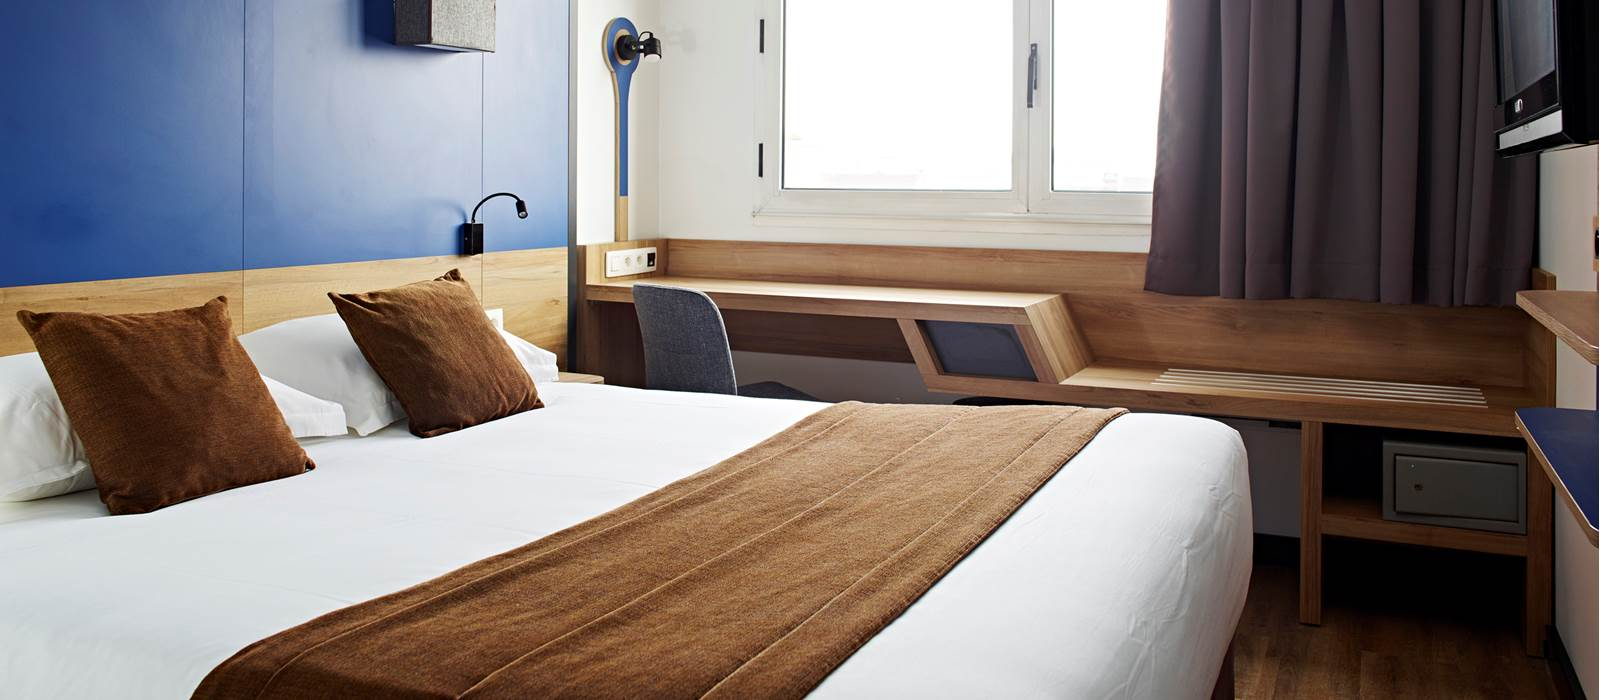 Prix Chambre Hotel Paris